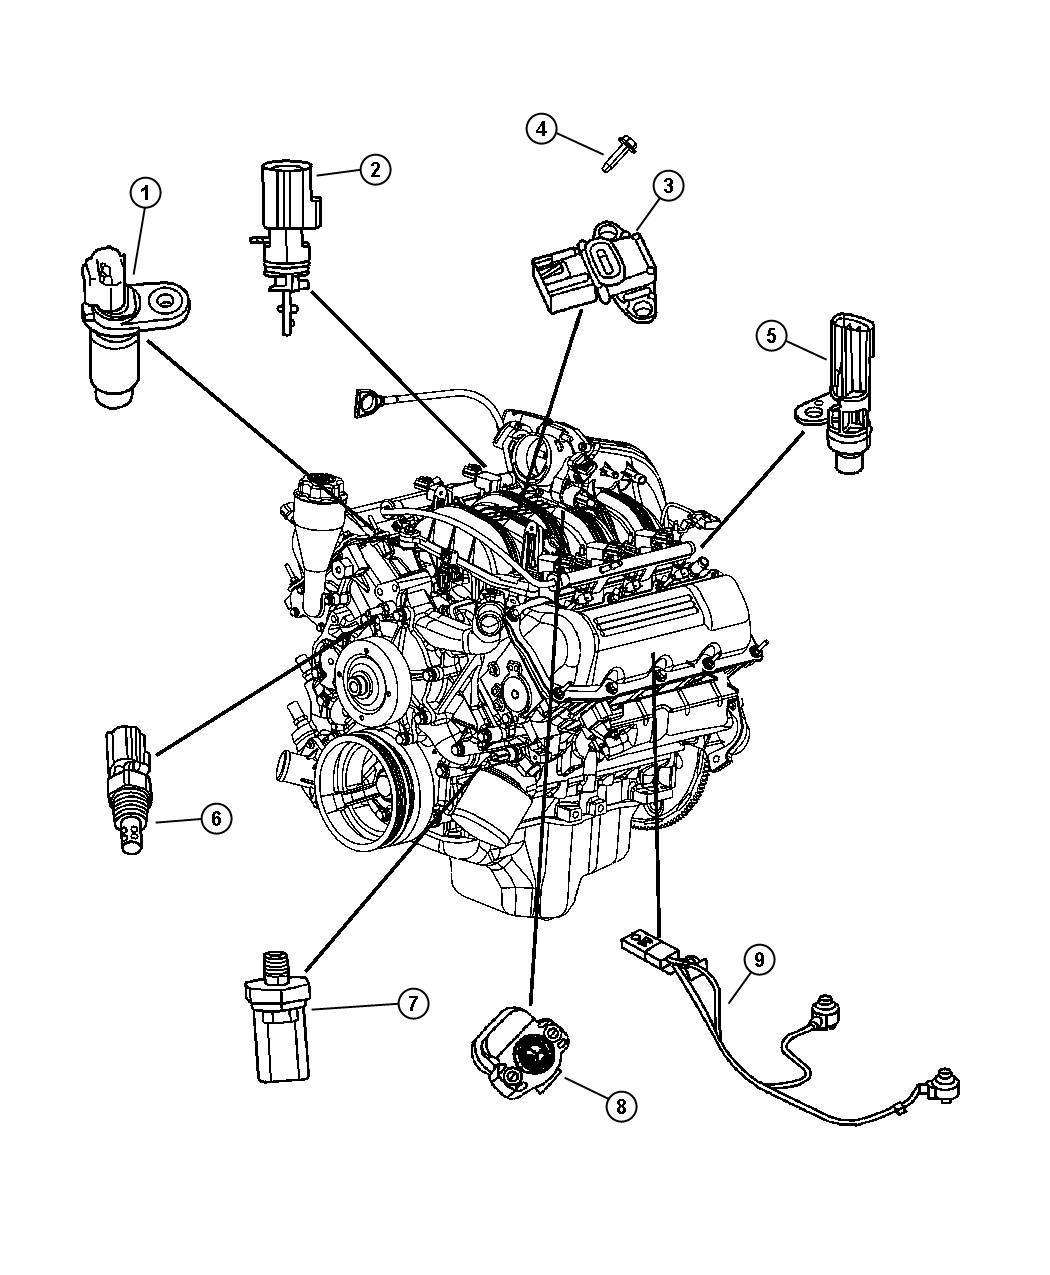 Jeep Grand Cherokee Sensor Coolant Temperature Engine Oil Cooler